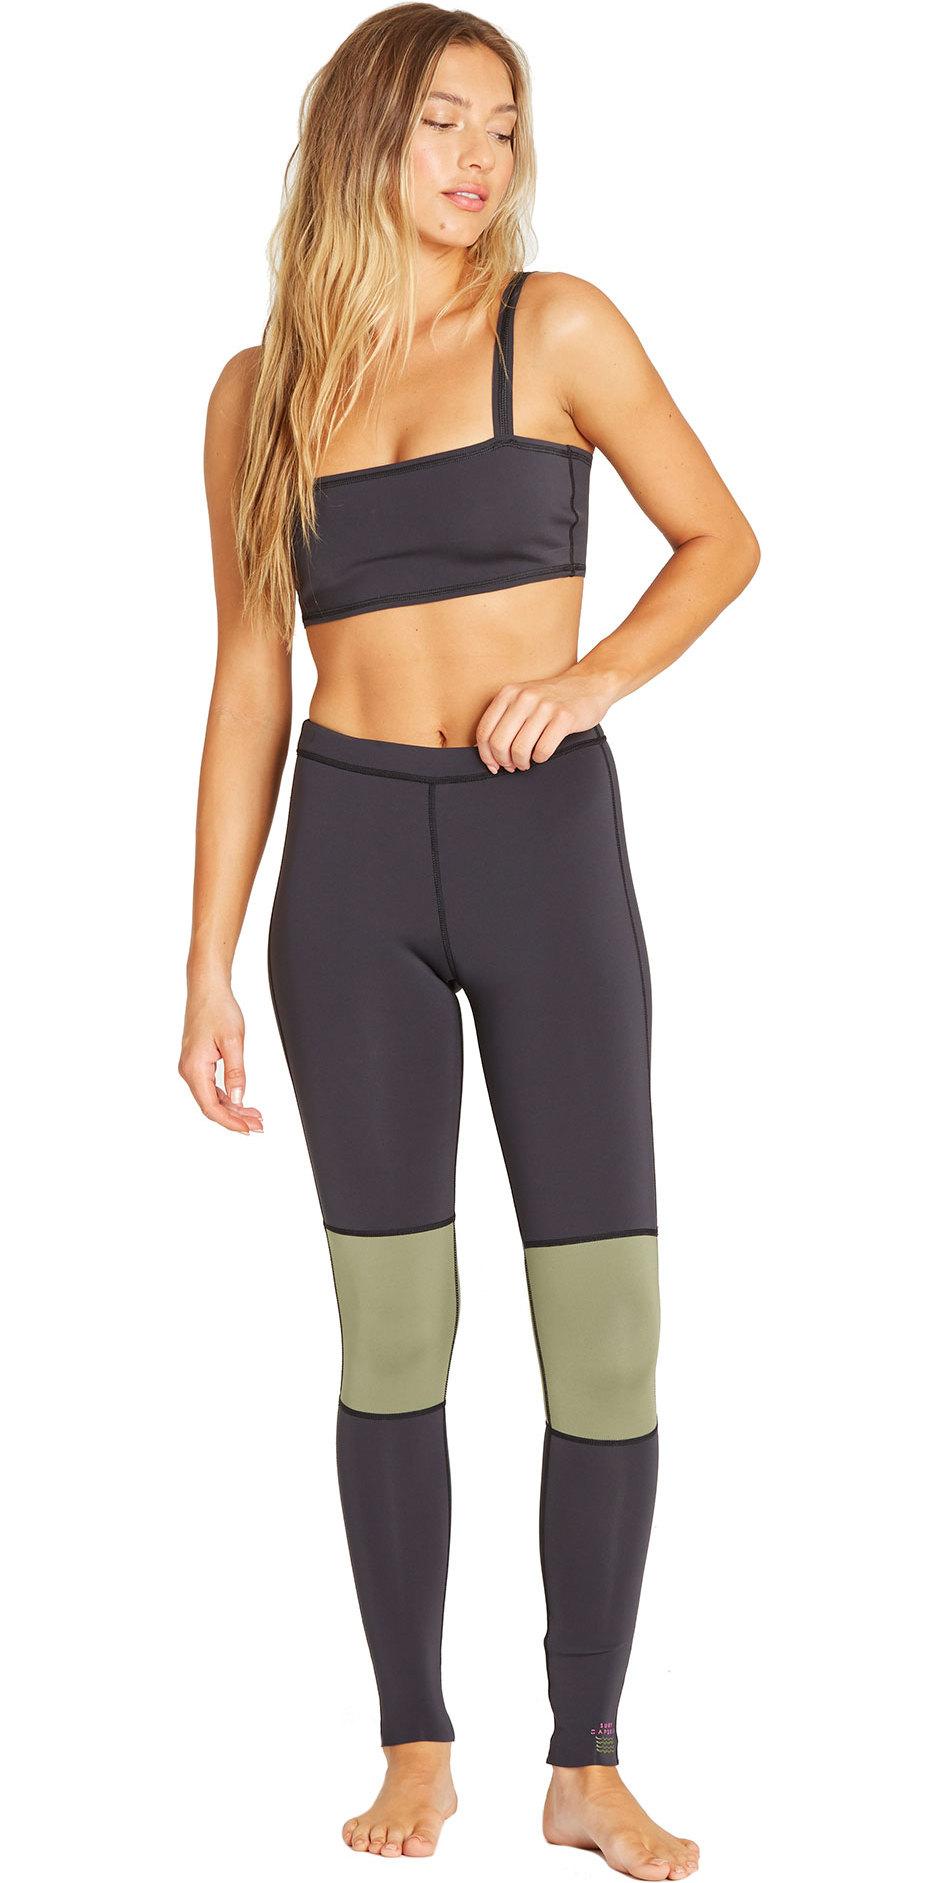 f0c8de8e806ba 2019 Billabong Womens 1mm Neoprene Sea Legs Black Olive N41g03 - Wetsuit  Trousers - Rash | Wetsuit Outlet